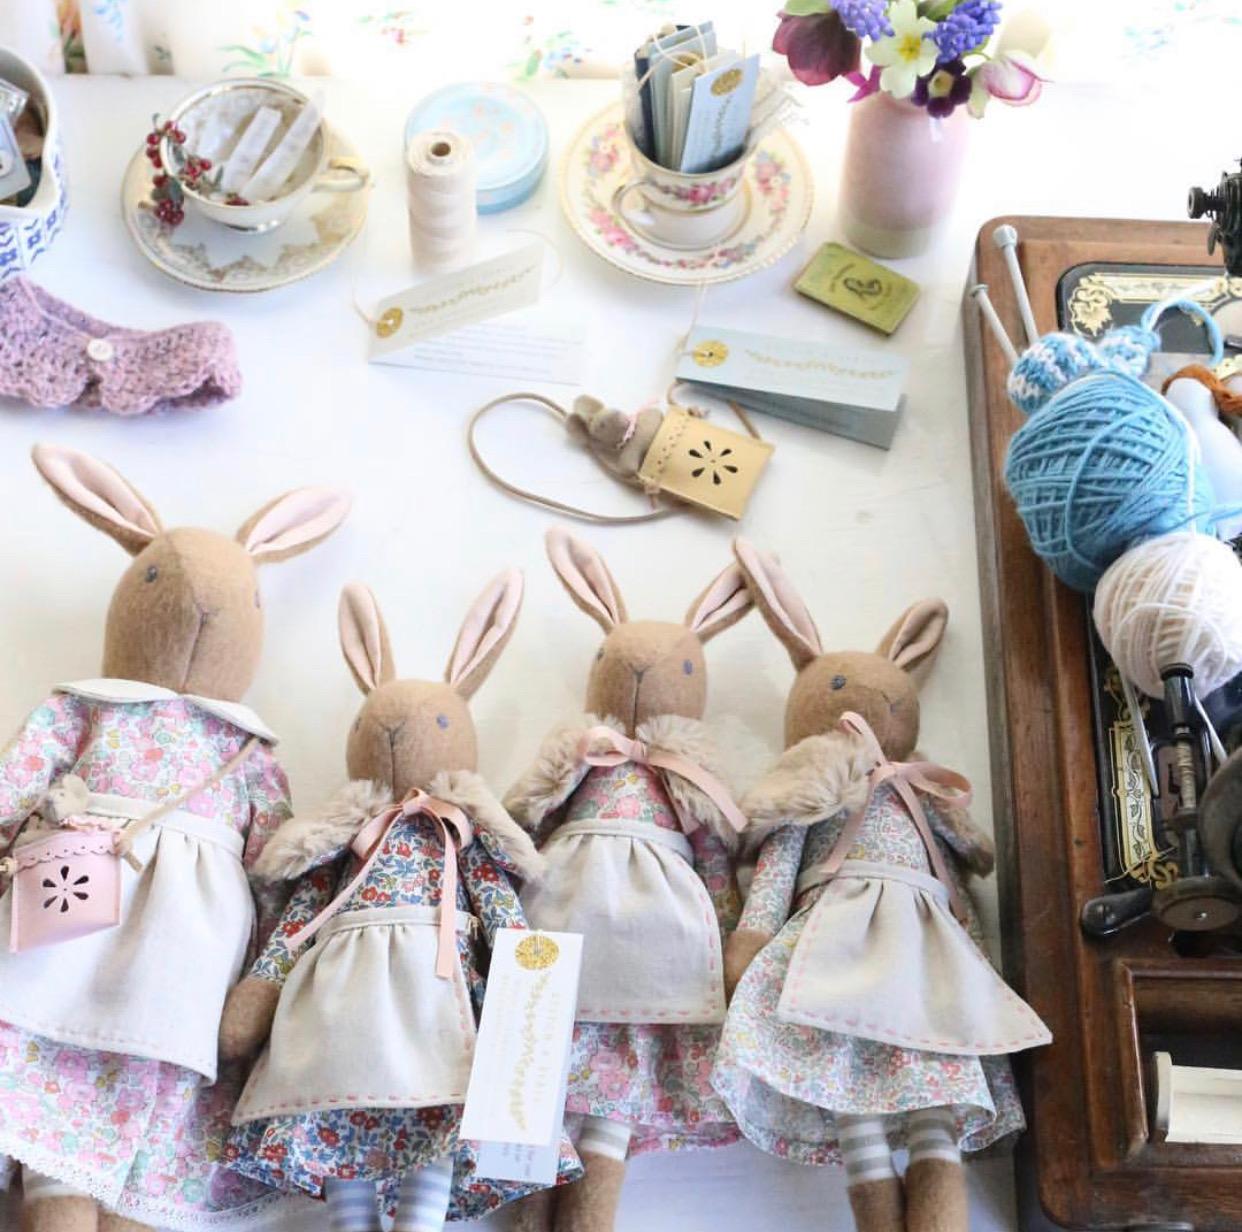 Exquisite heirloom dolls from @katylivings